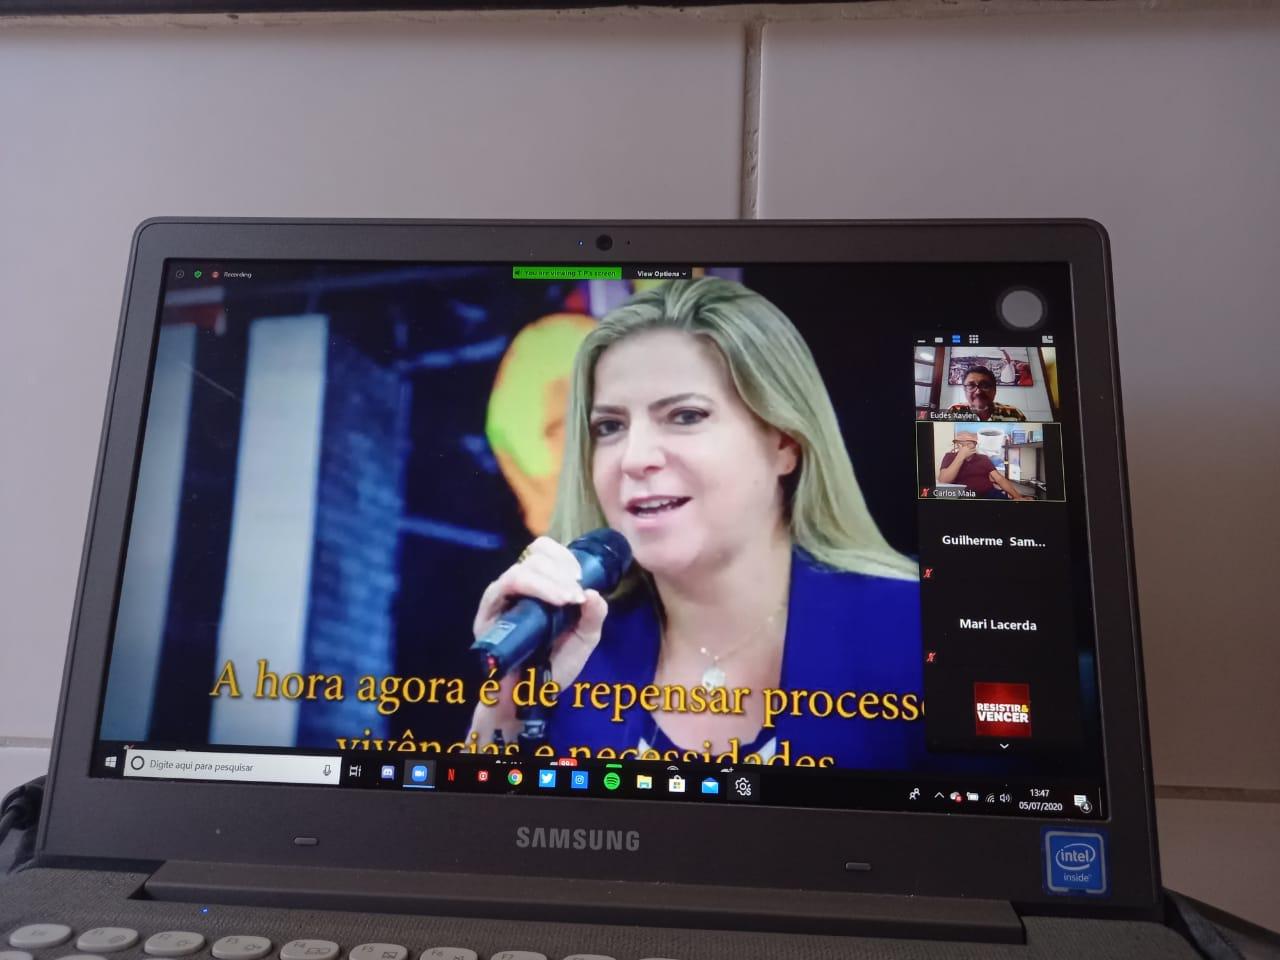 PT homologa Luizianne Lins  como pré-candidata à Prefeitura de Fortaleza